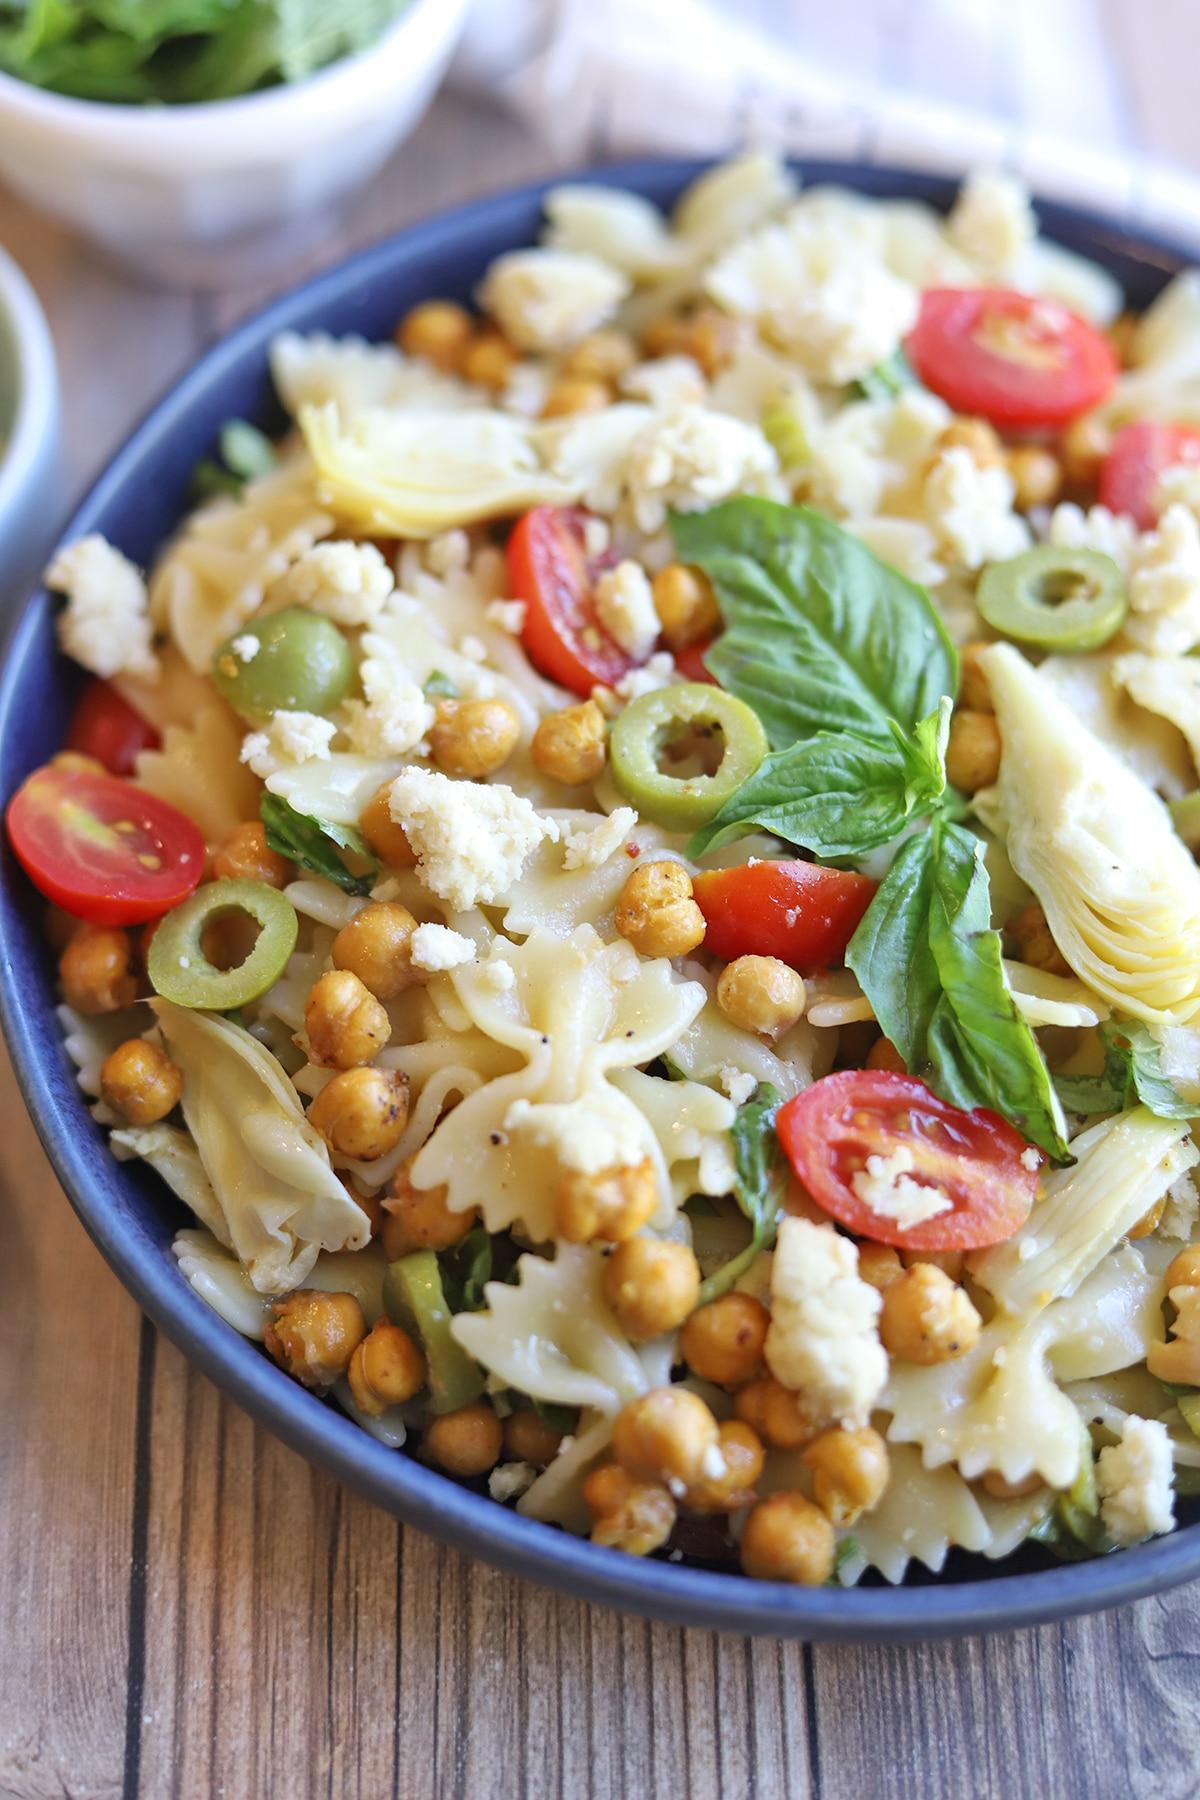 Close-up blue bowl with bowtie pasta salad.